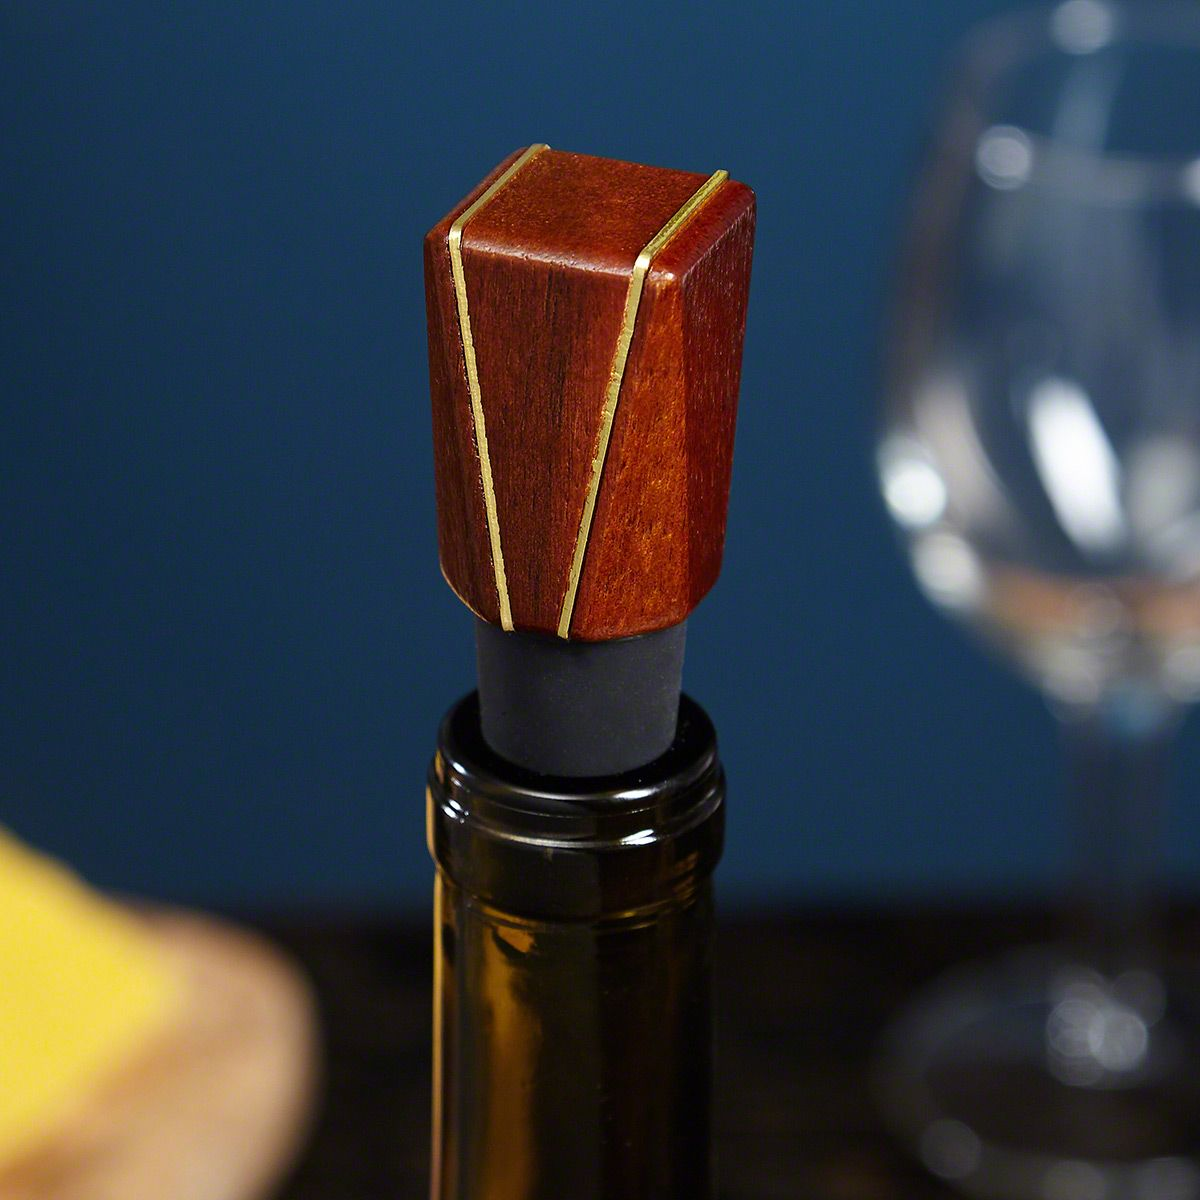 Goldsmith Acacia Wood Wine Stopper